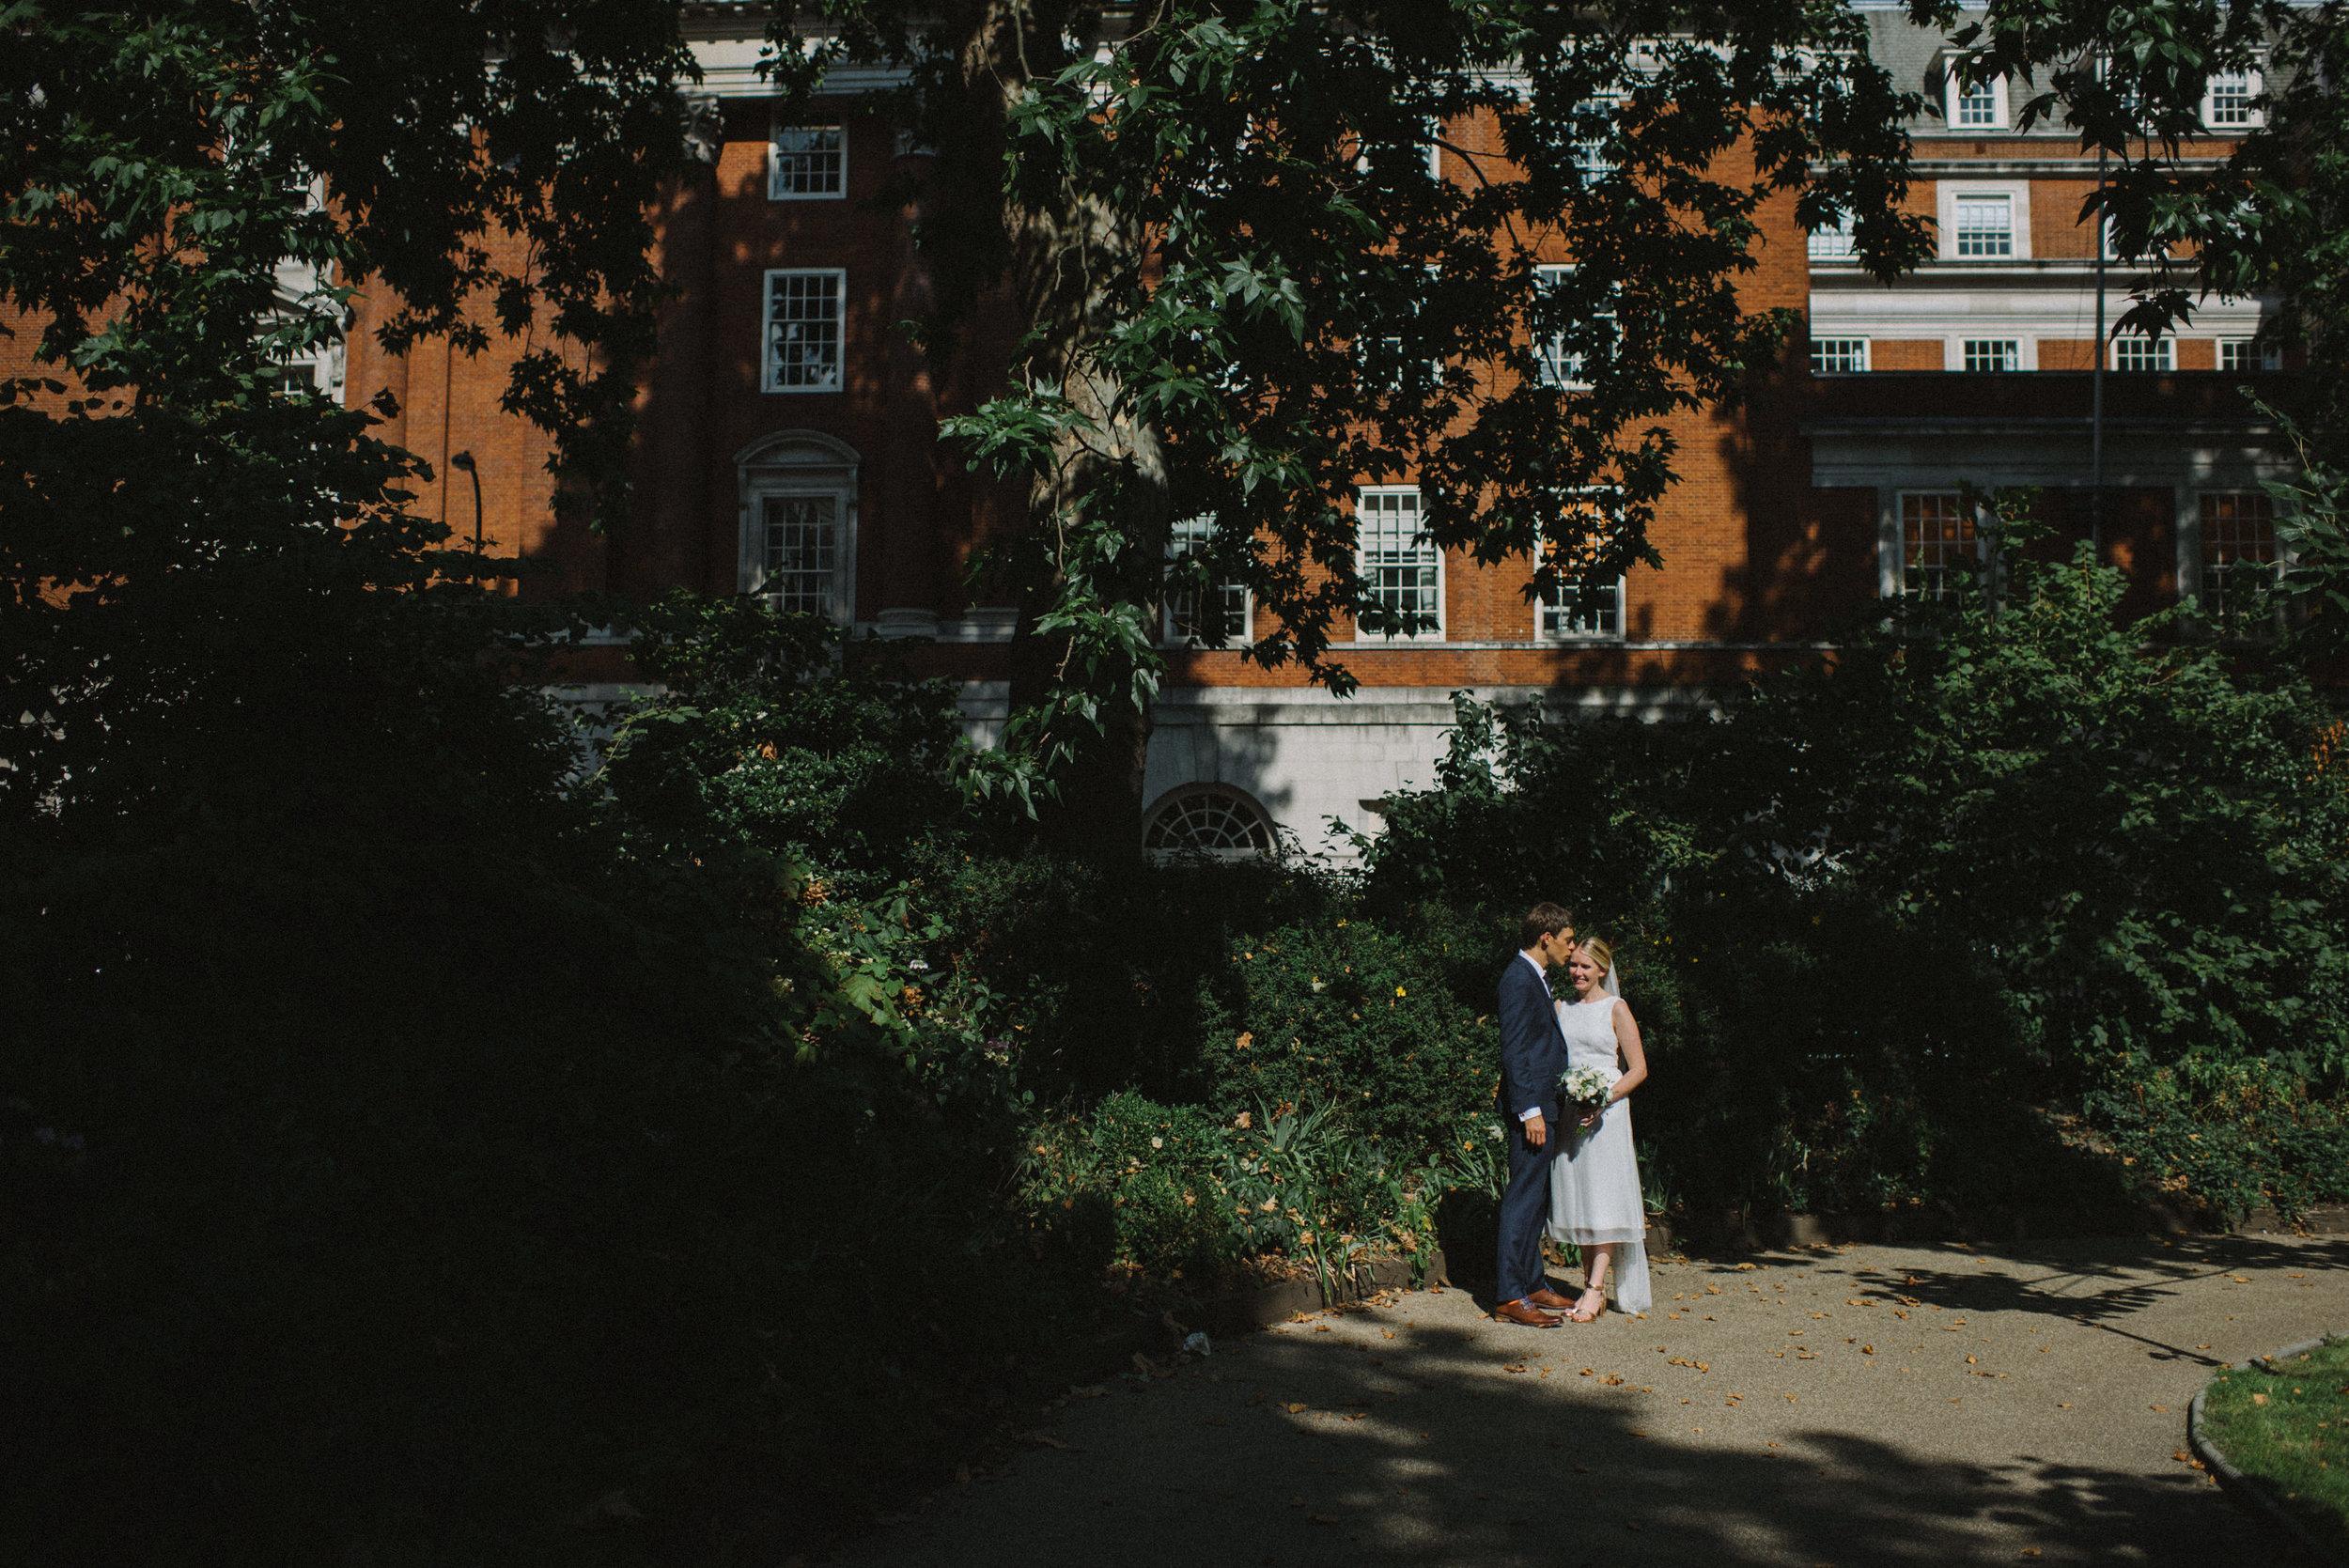 0207-LISA-DEVINE-PHOTOGRAPHY-ALTERNATIVE-WEDDING-PHOTOGRAPHY-SCOTLAND-DESTINATION-WEDDINGS-GLASGOW-WEDDINGS-COOL-WEDDINGS-STYLISH-WEDDINGS.JPG